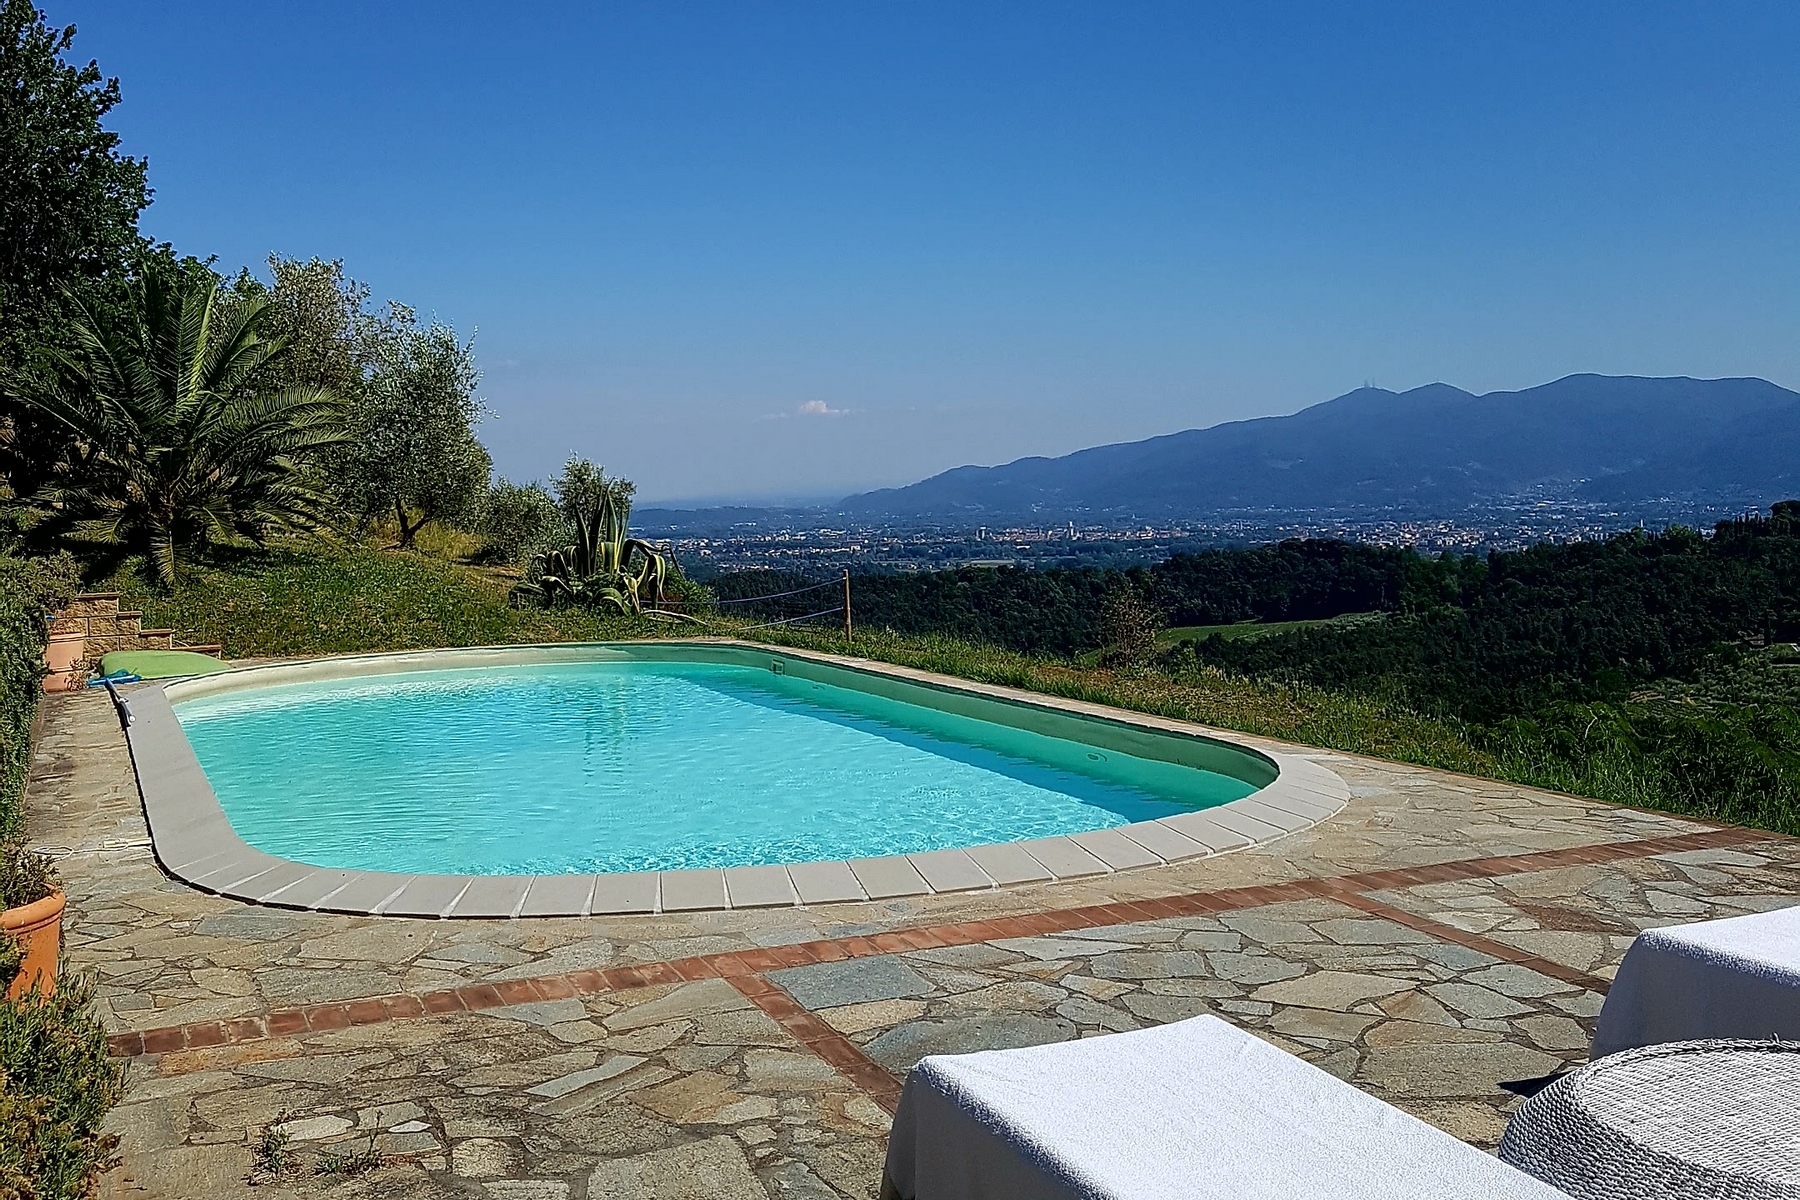 Villa in Vendita a Lucca: 5 locali, 550 mq - Foto 8